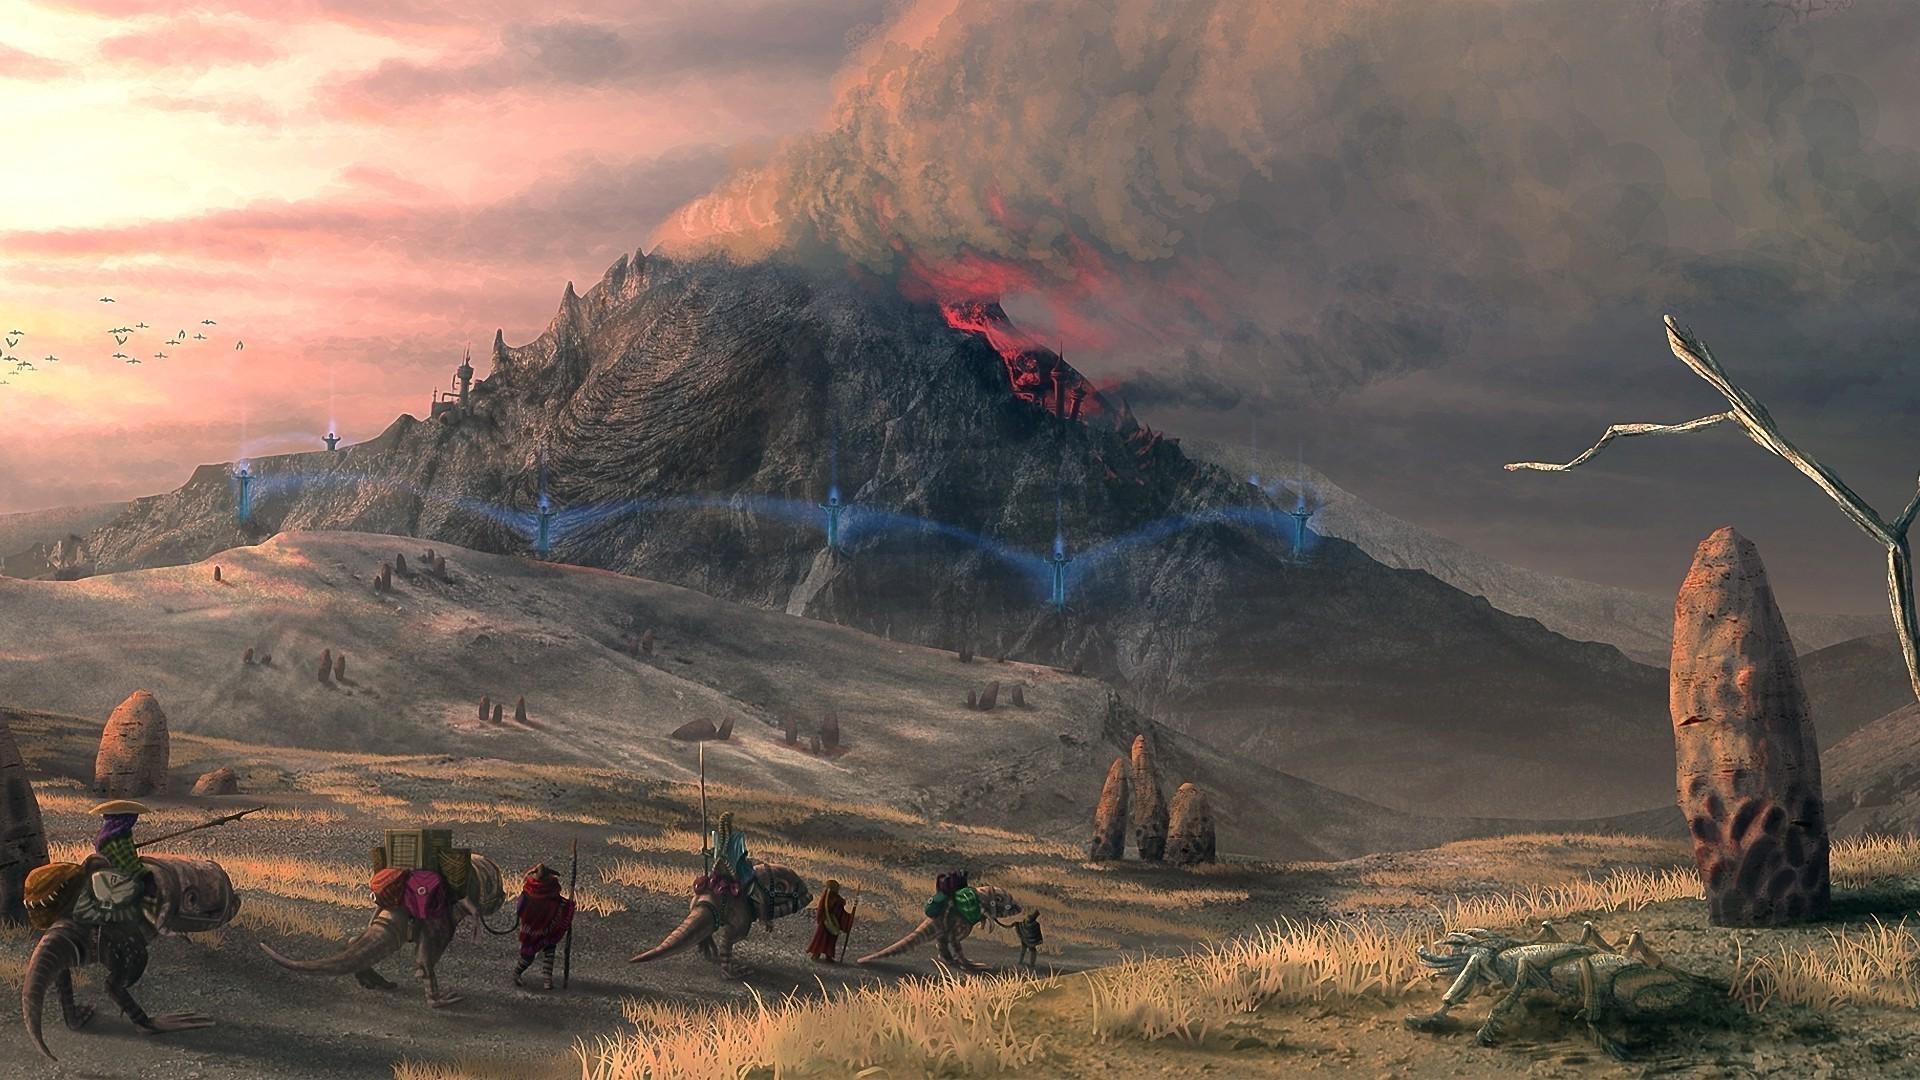 Video Game – The Elder Scrolls III: Morrowind Wallpaper